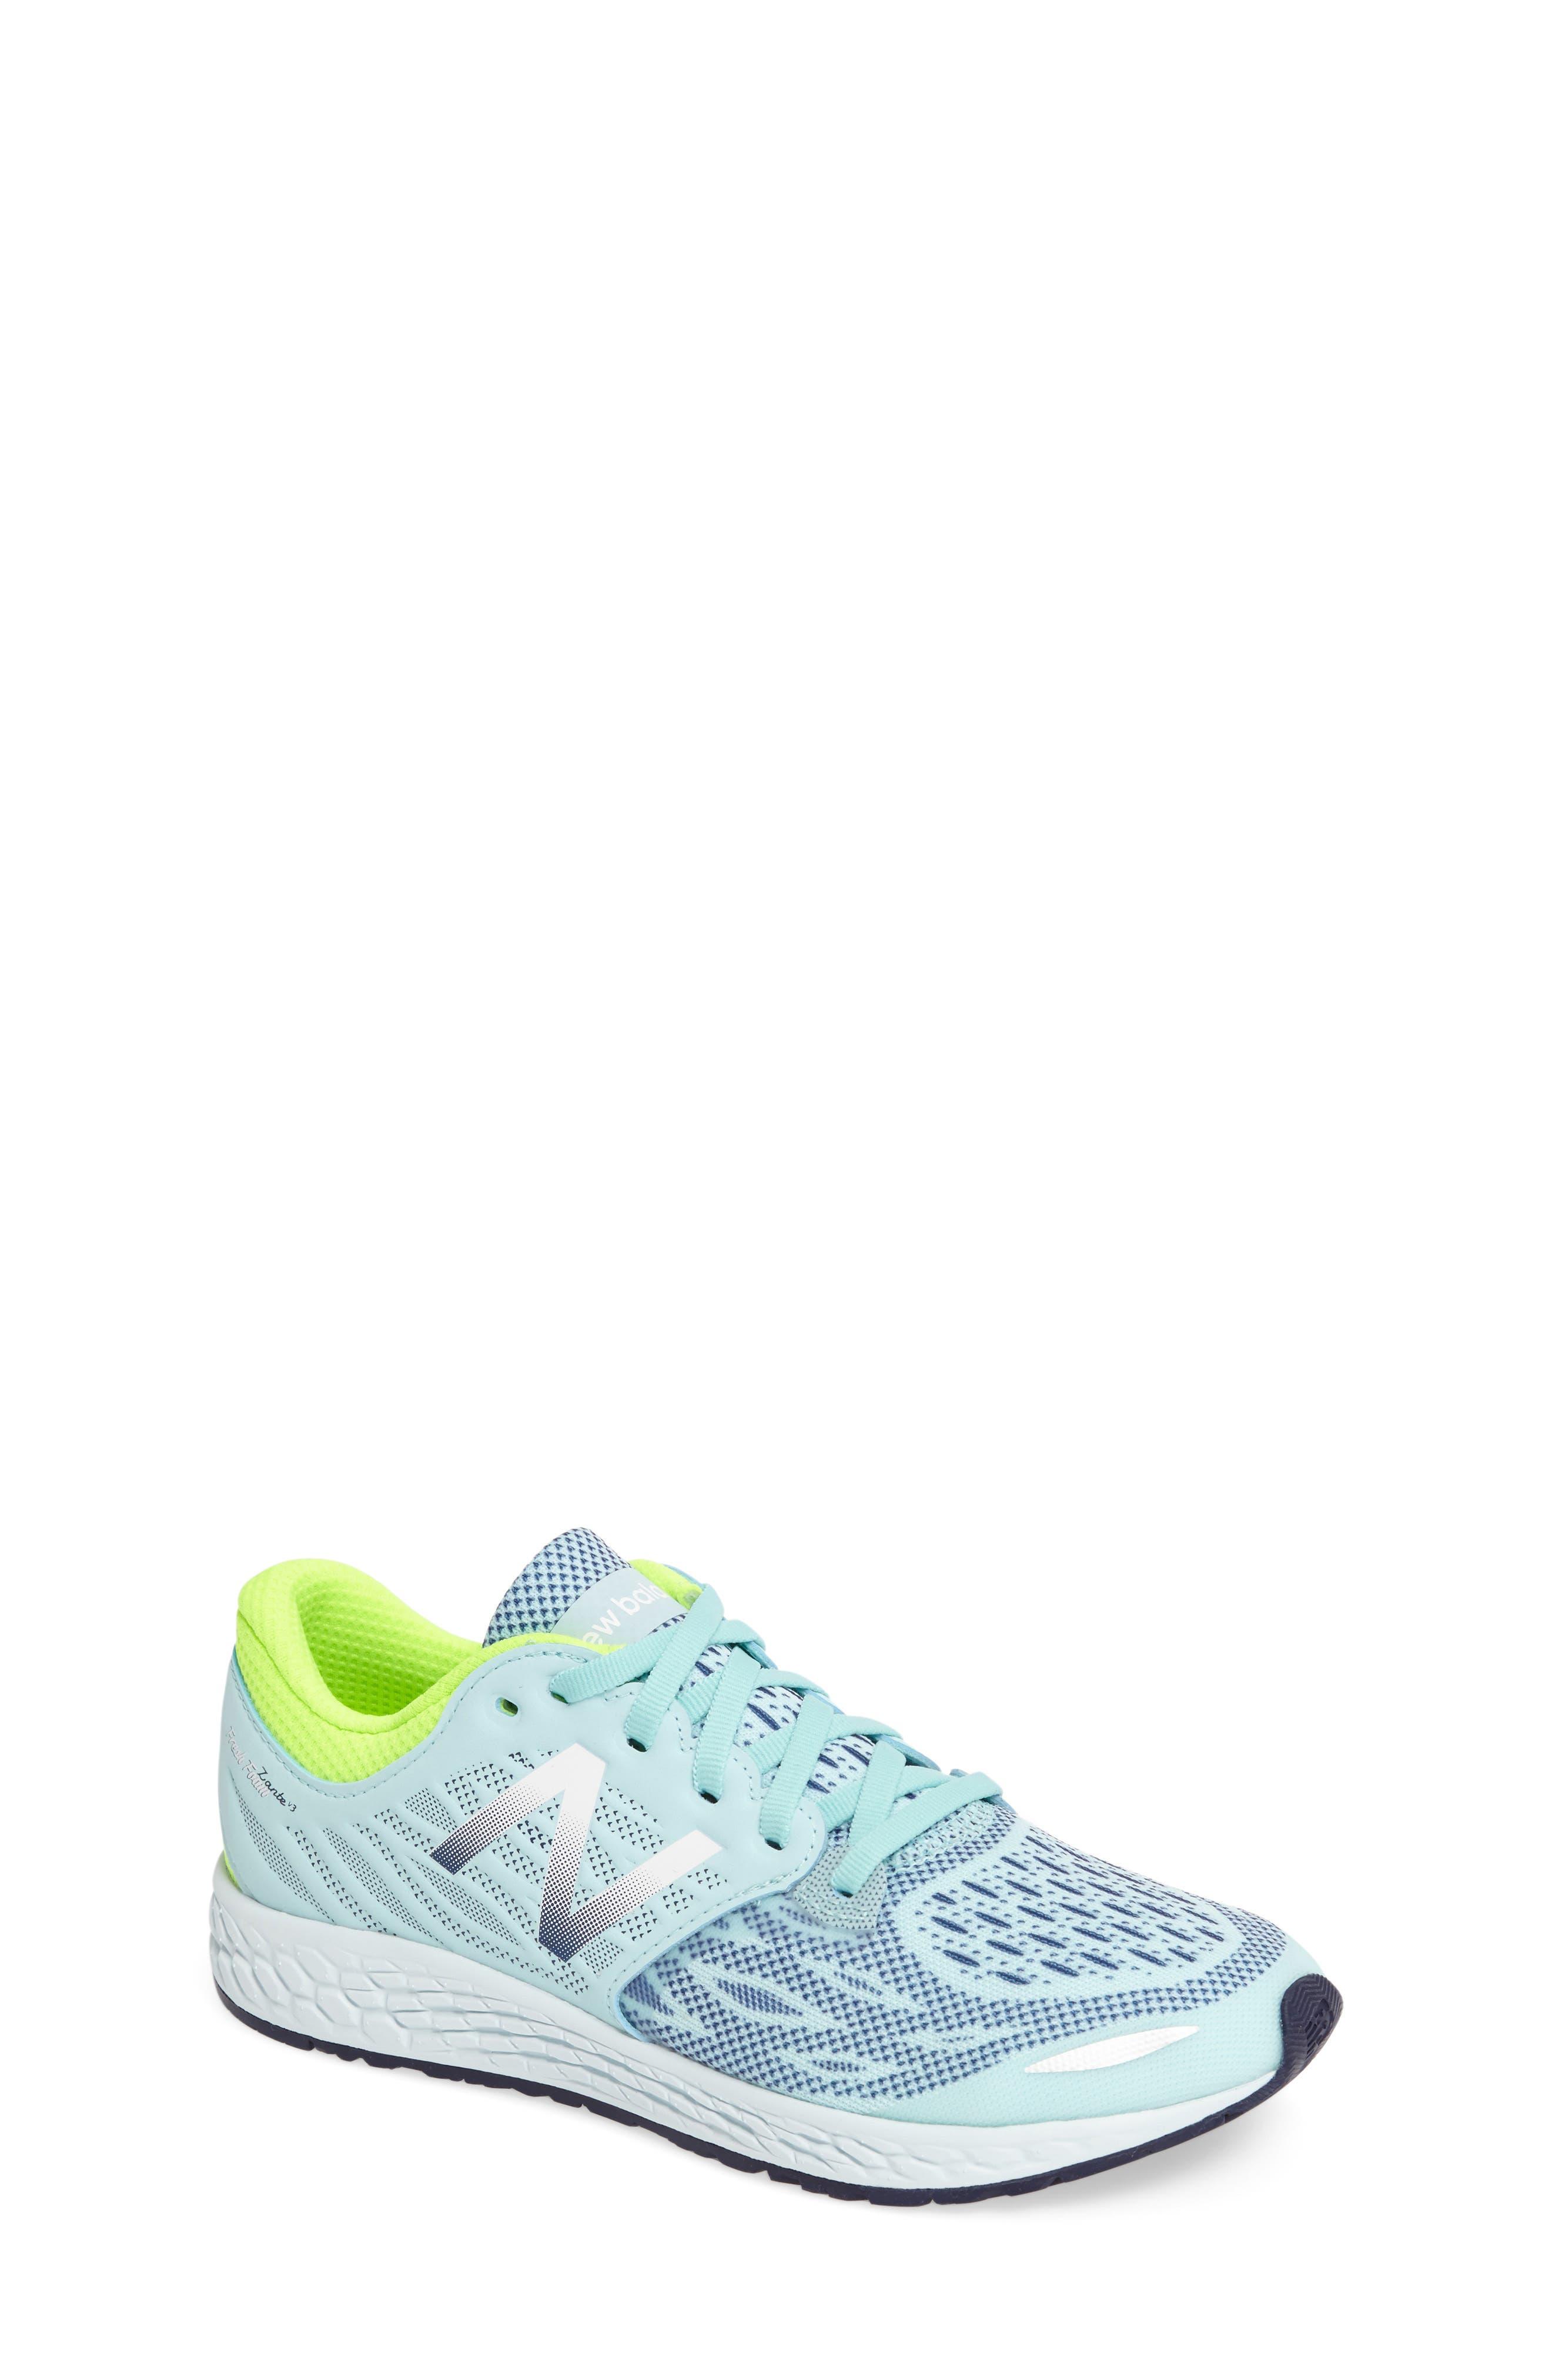 Fresh Foam Sneaker,                             Main thumbnail 1, color,                             Teal/Green